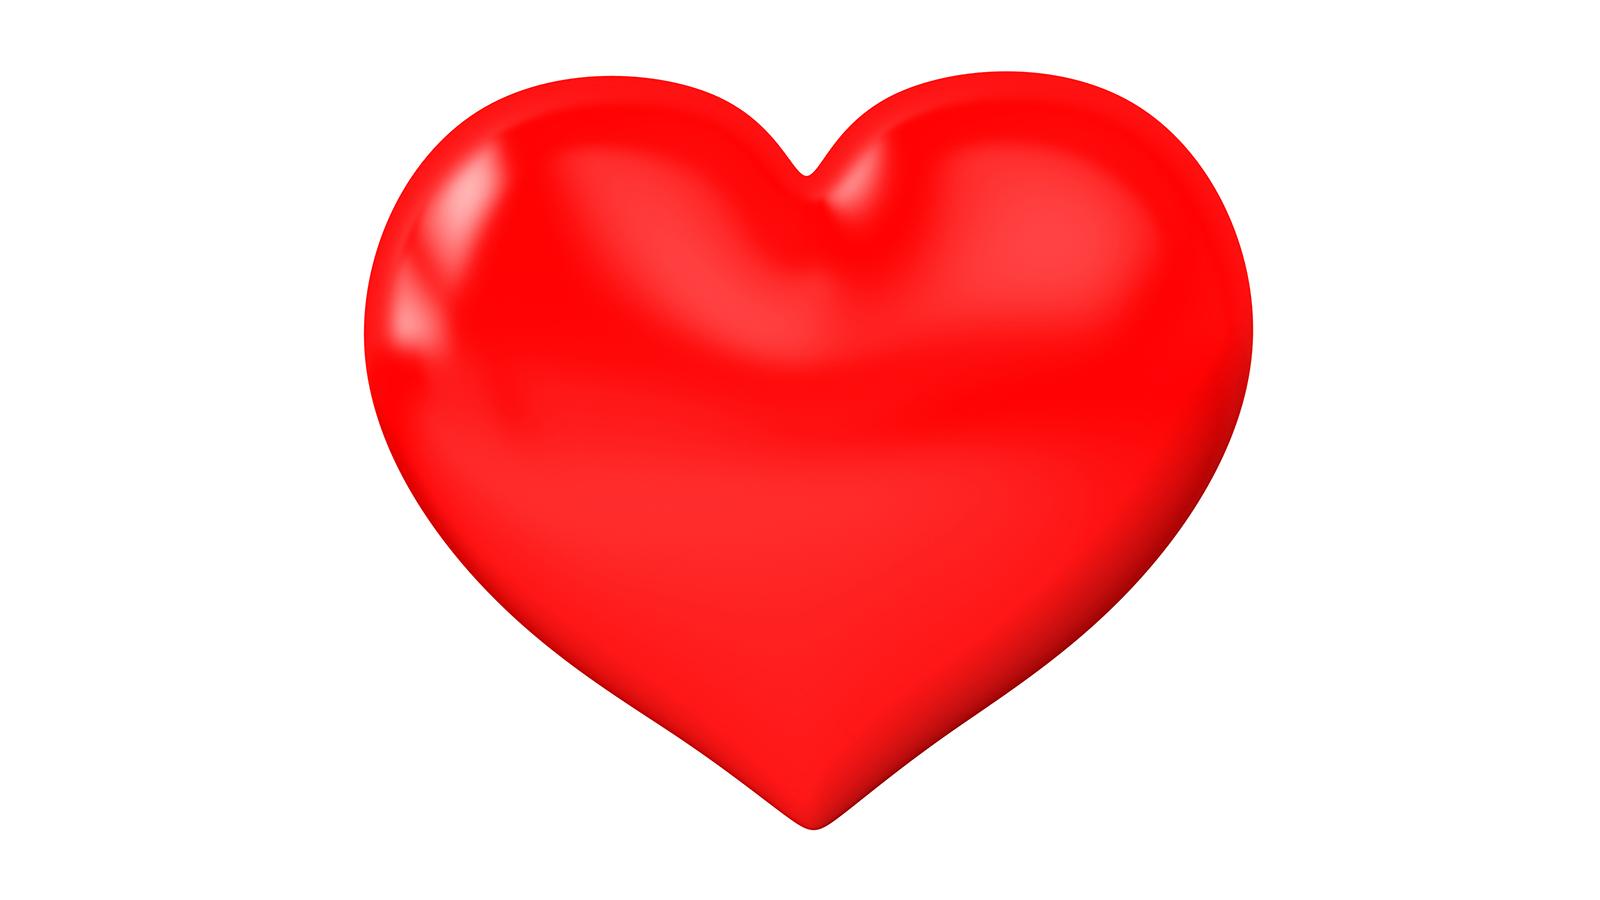 heart-ngsversion-1396531395268